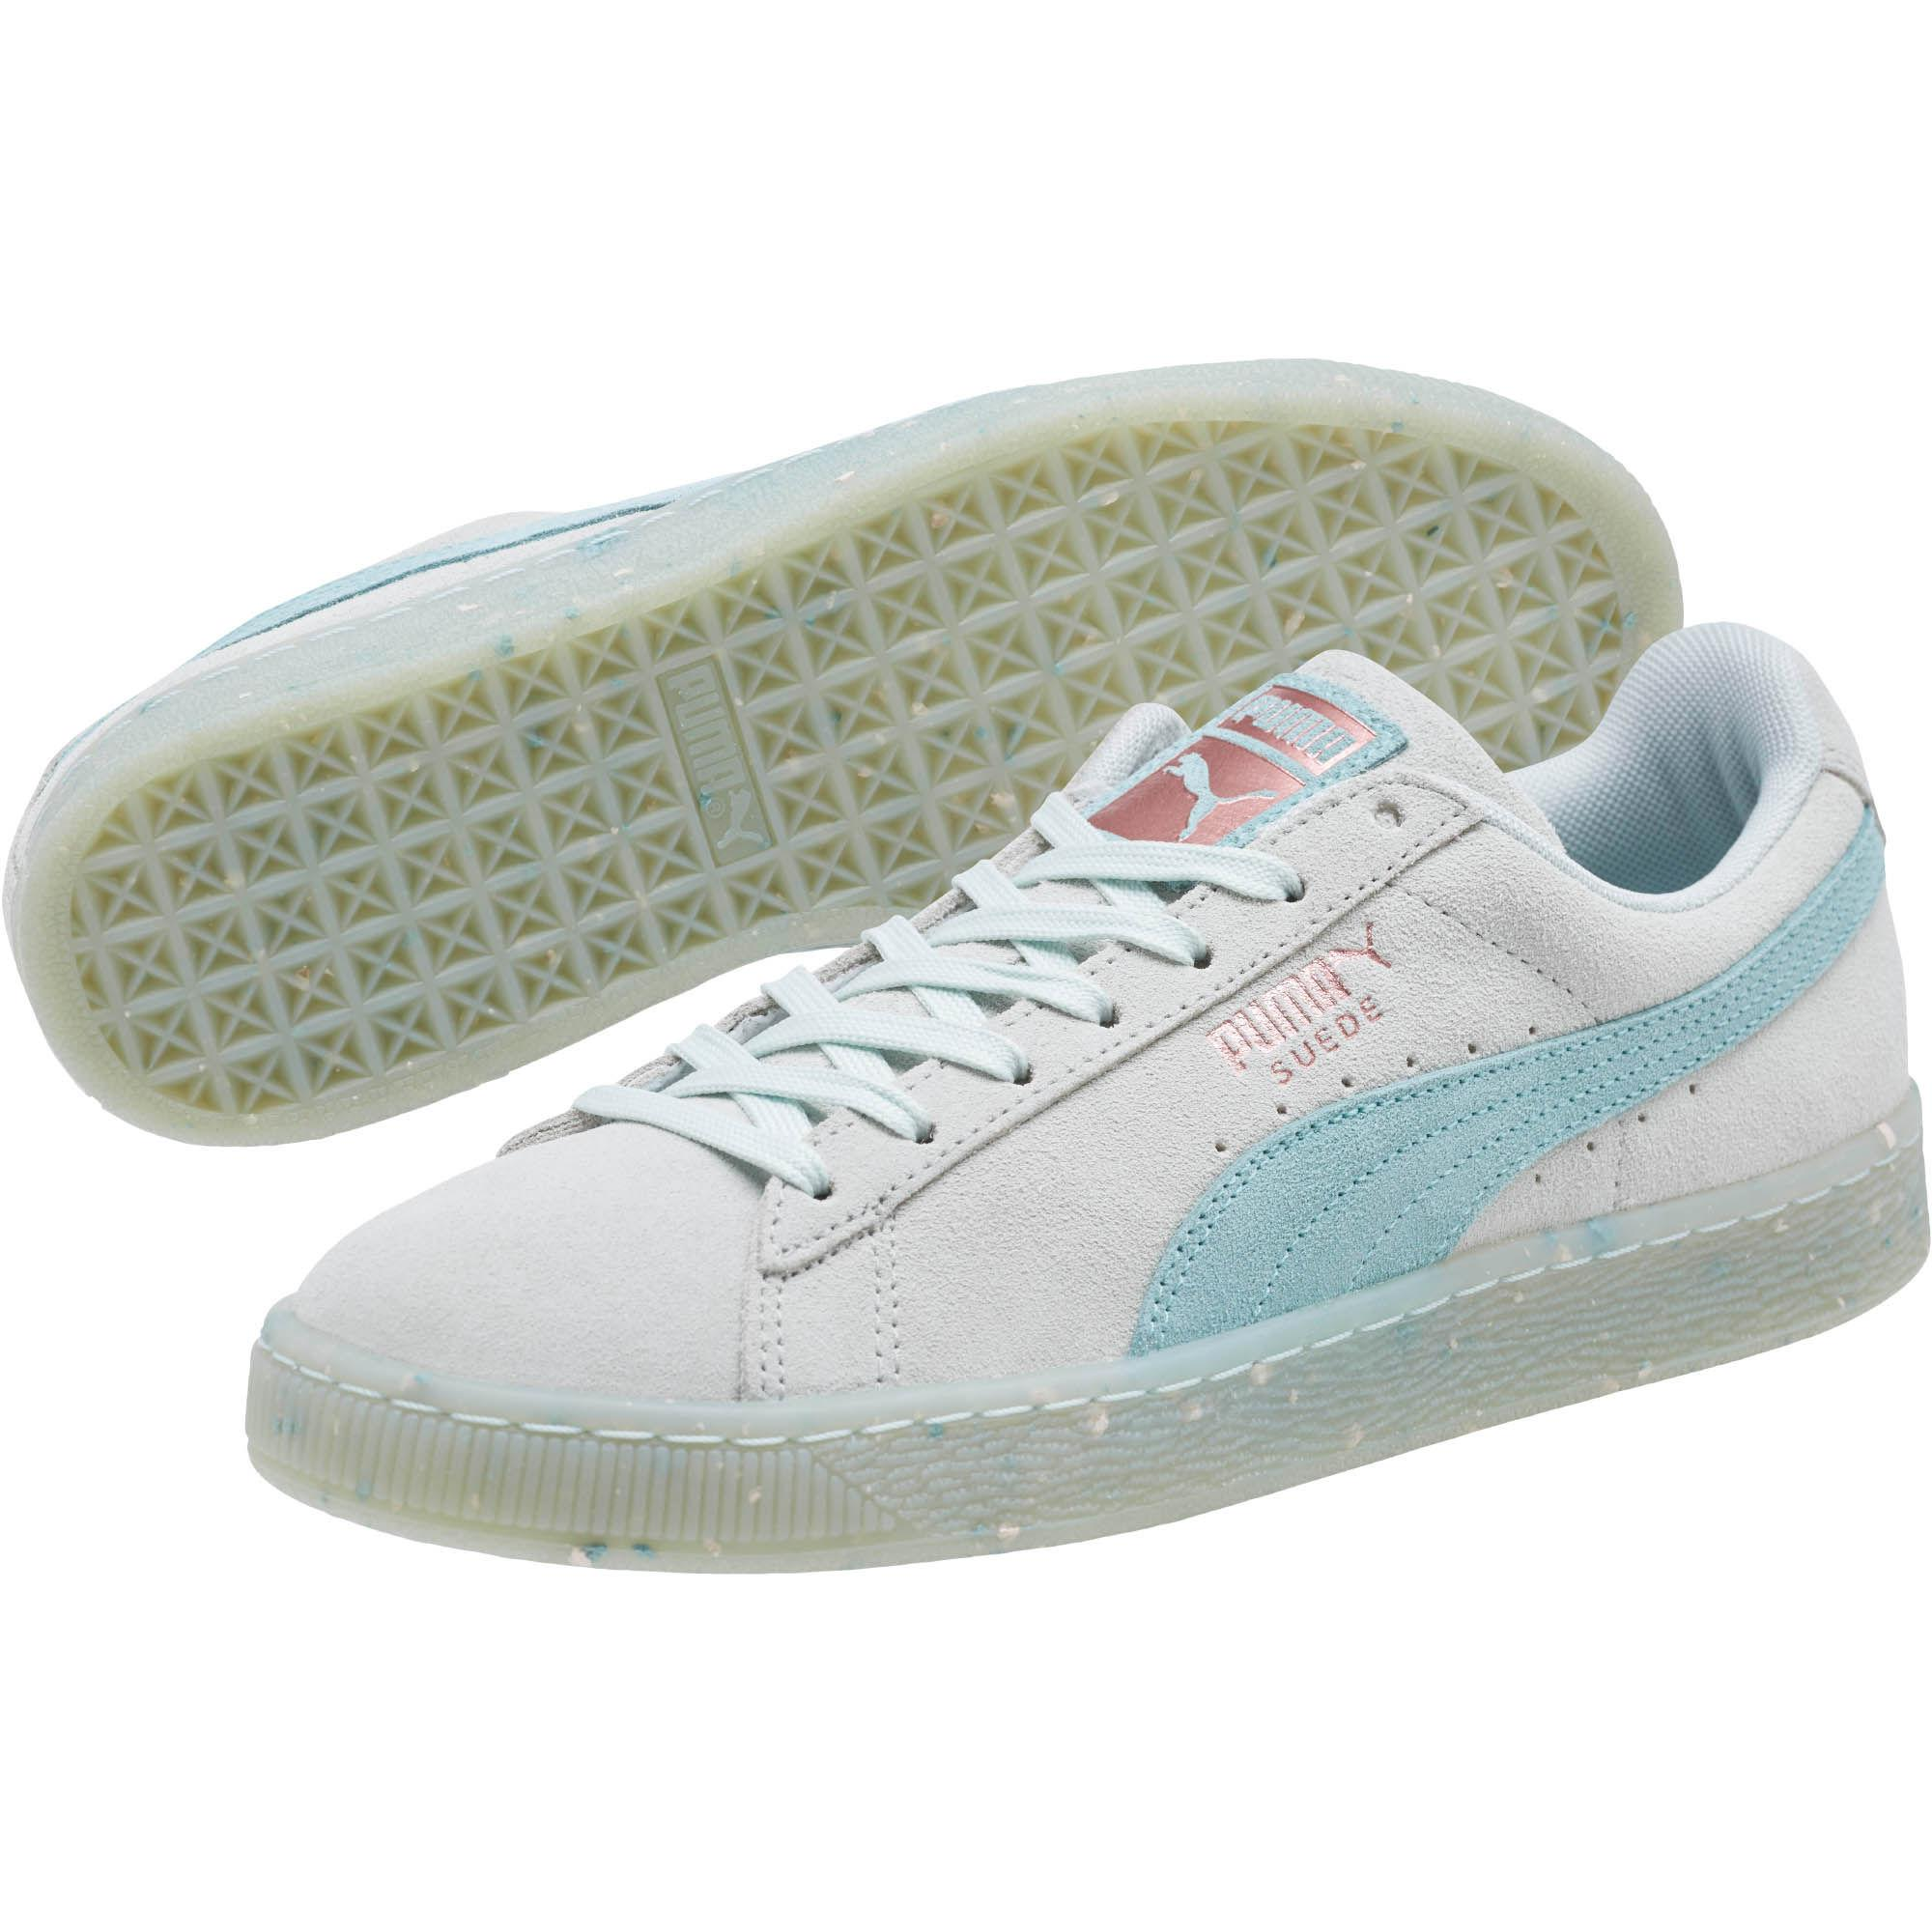 PUMA - Blue Suede Classic Glitz Women s Sneakers - Lyst. View fullscreen 1b752df9d